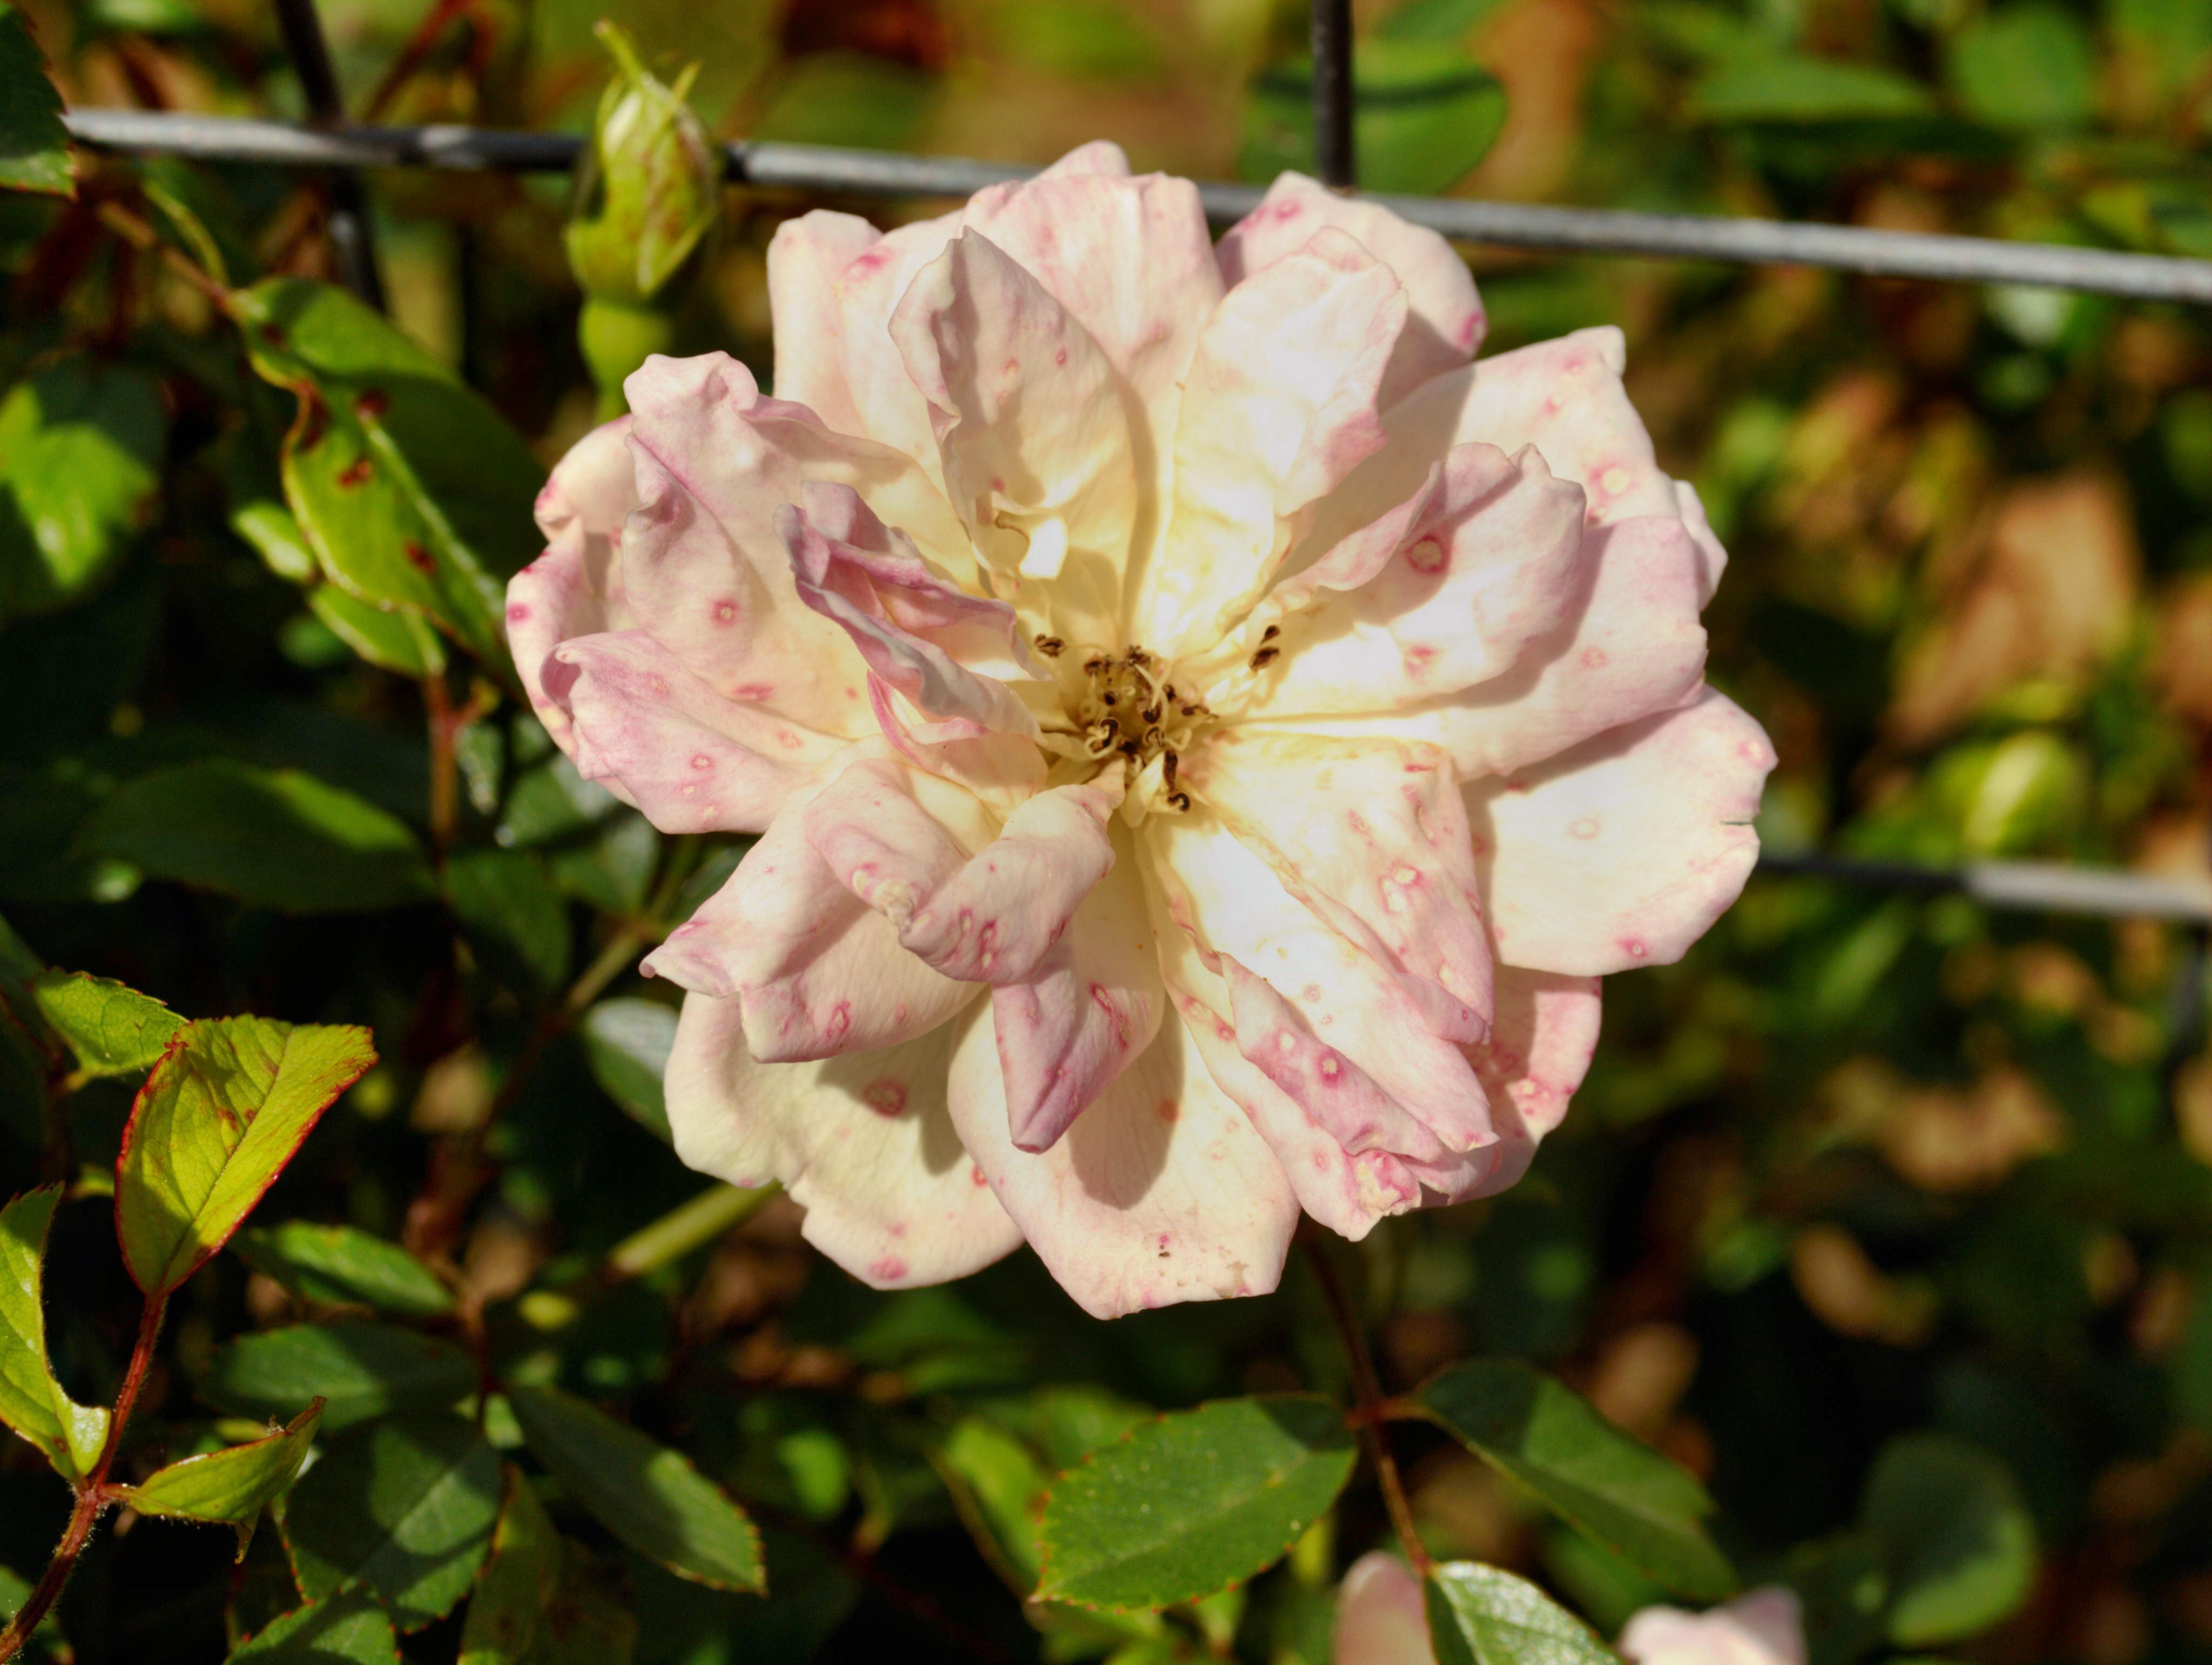 Rosa-Phyllis-Bide-2.jpeg